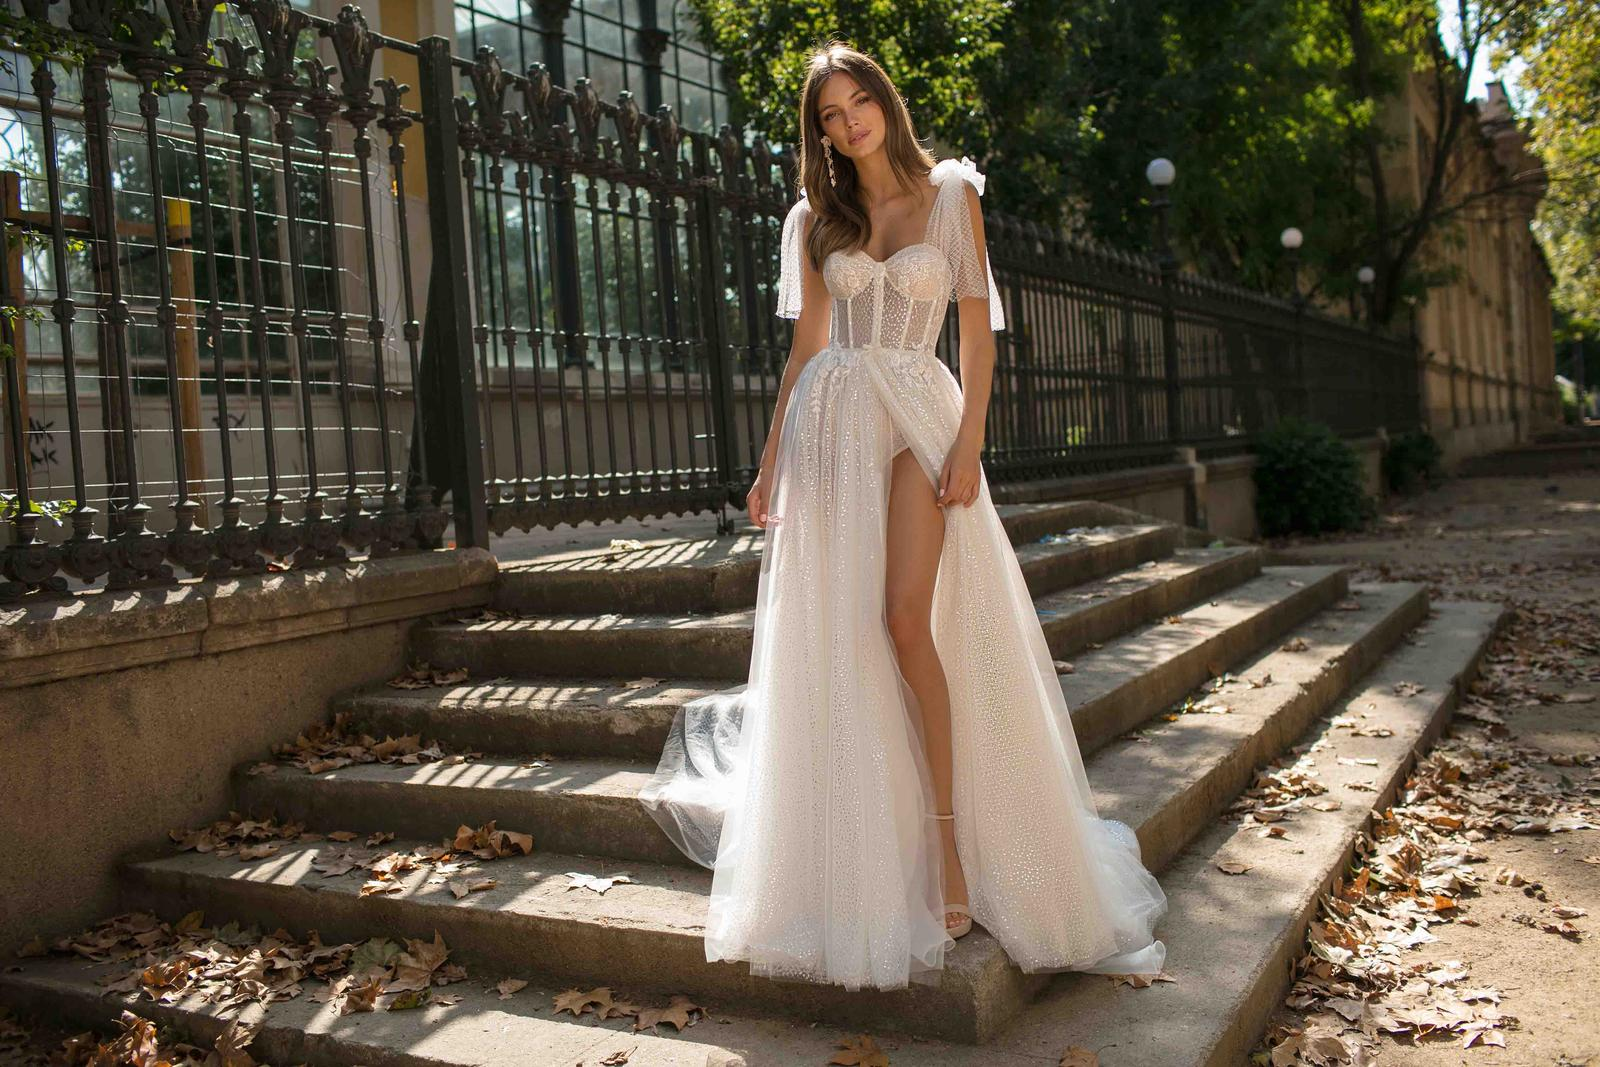 Muse by Berta * Svadobné šaty z kolekcií na rok 2019 - Obrázok č. 30